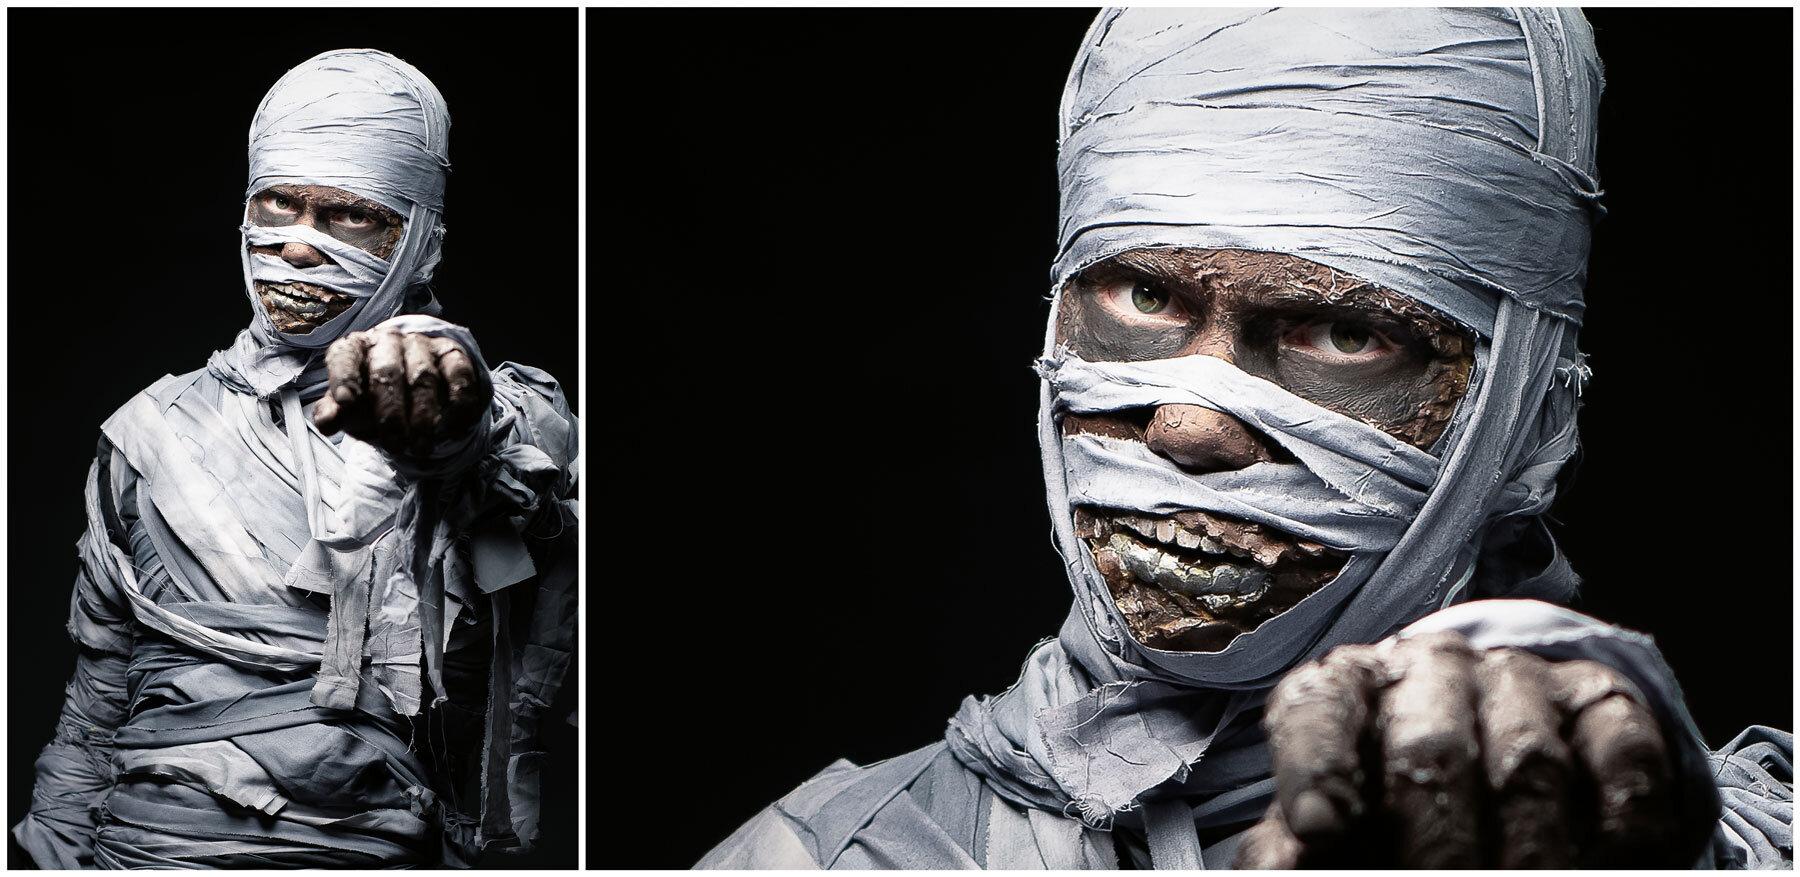 Tyler as the Mummy